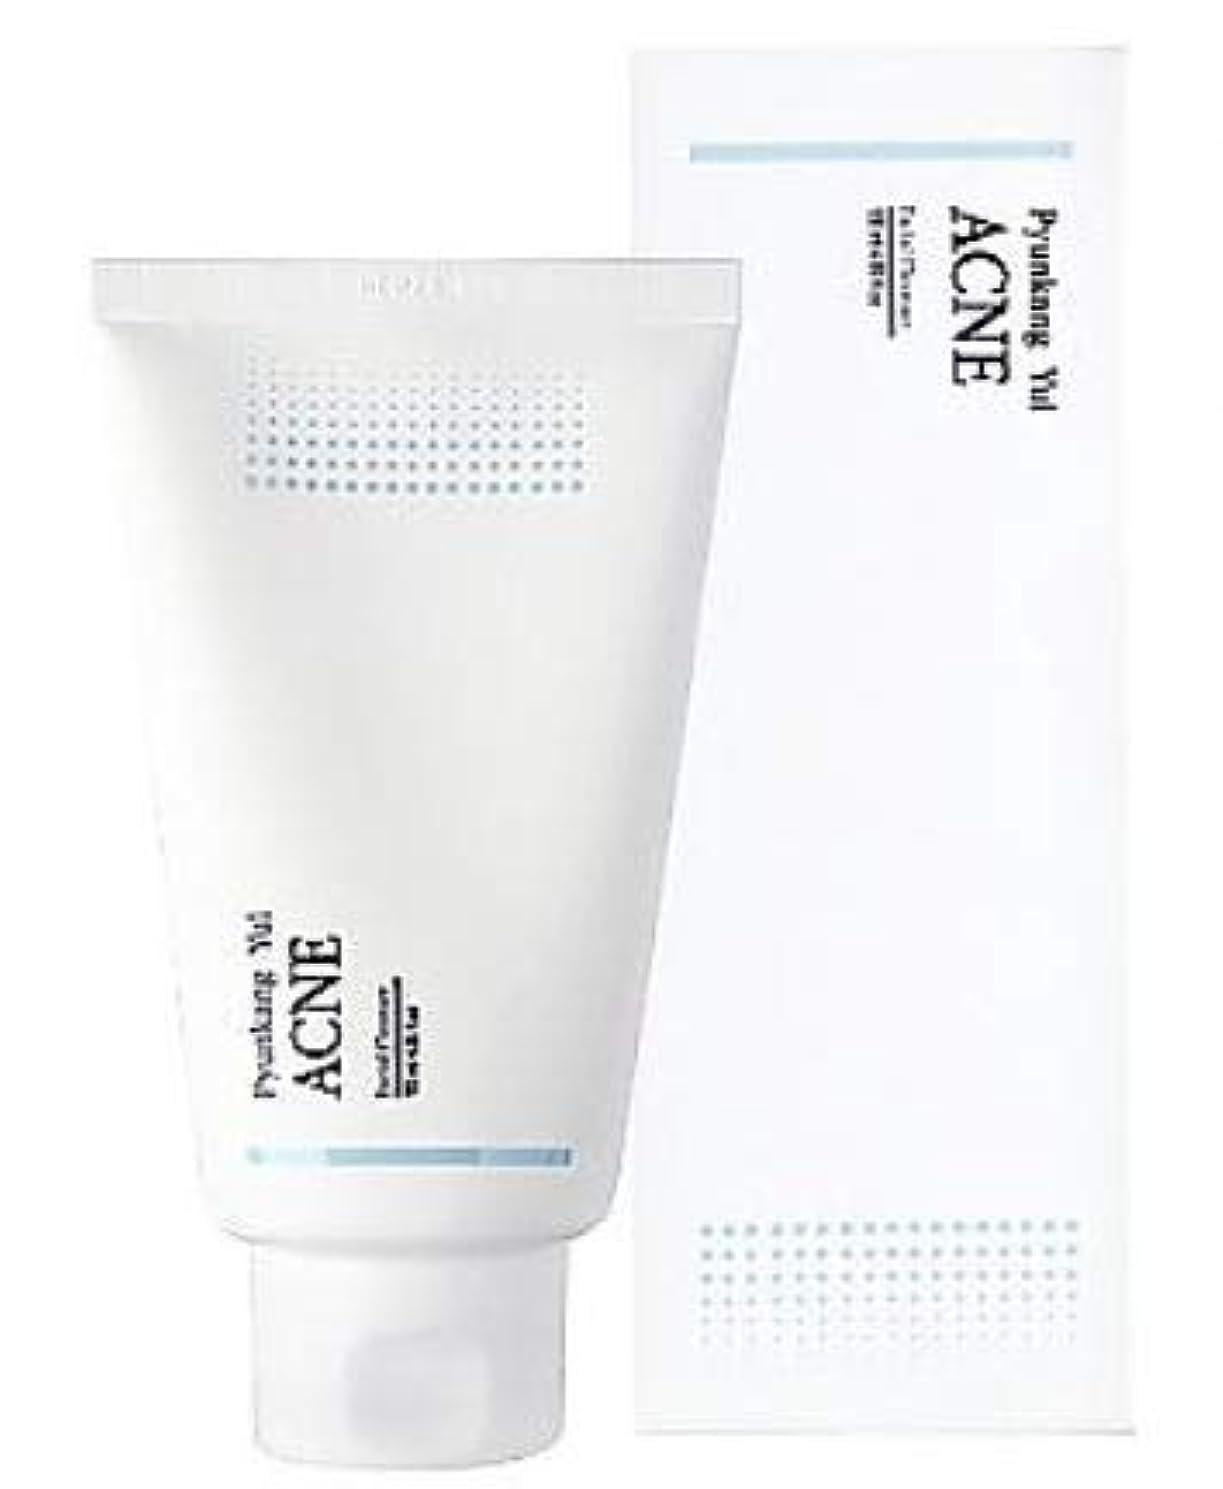 [ Pyunkang yul ] Pyunkang Yul ACNE Facial Cleanser 120ml / アクネ フェイシャル クレンザー 120ml [並行輸入品]